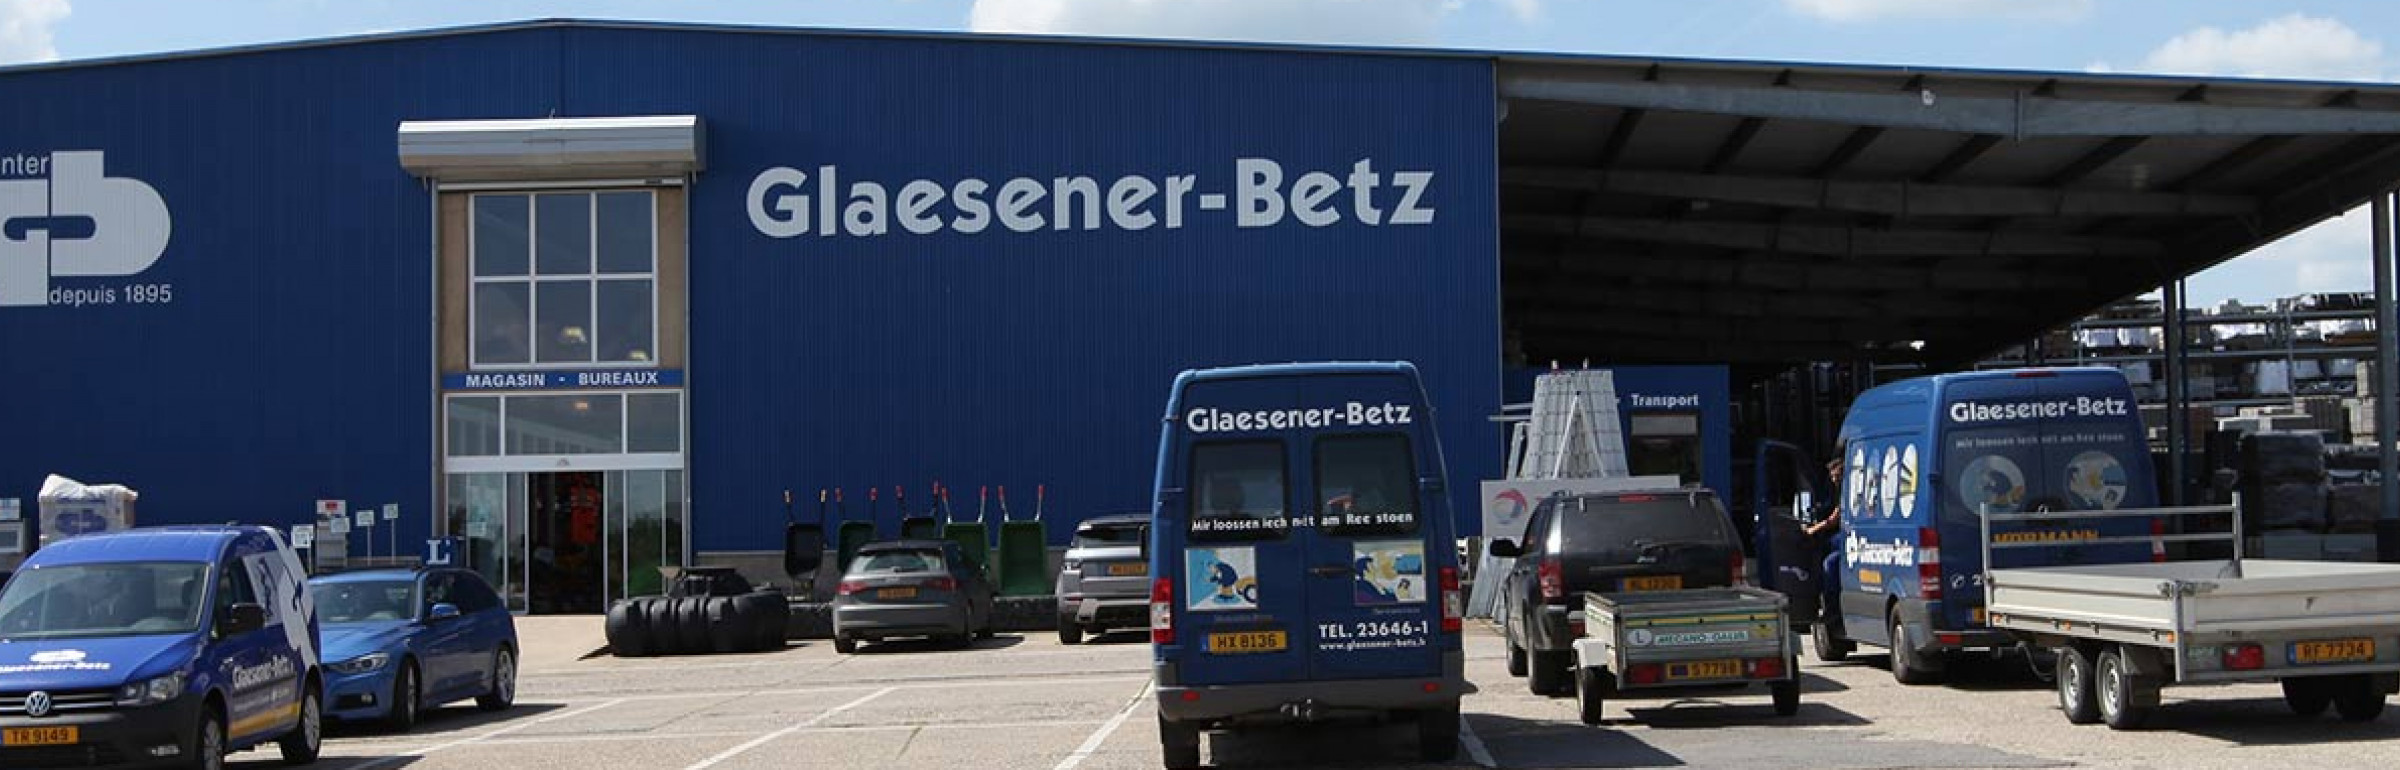 Banner Glaesener-Betz